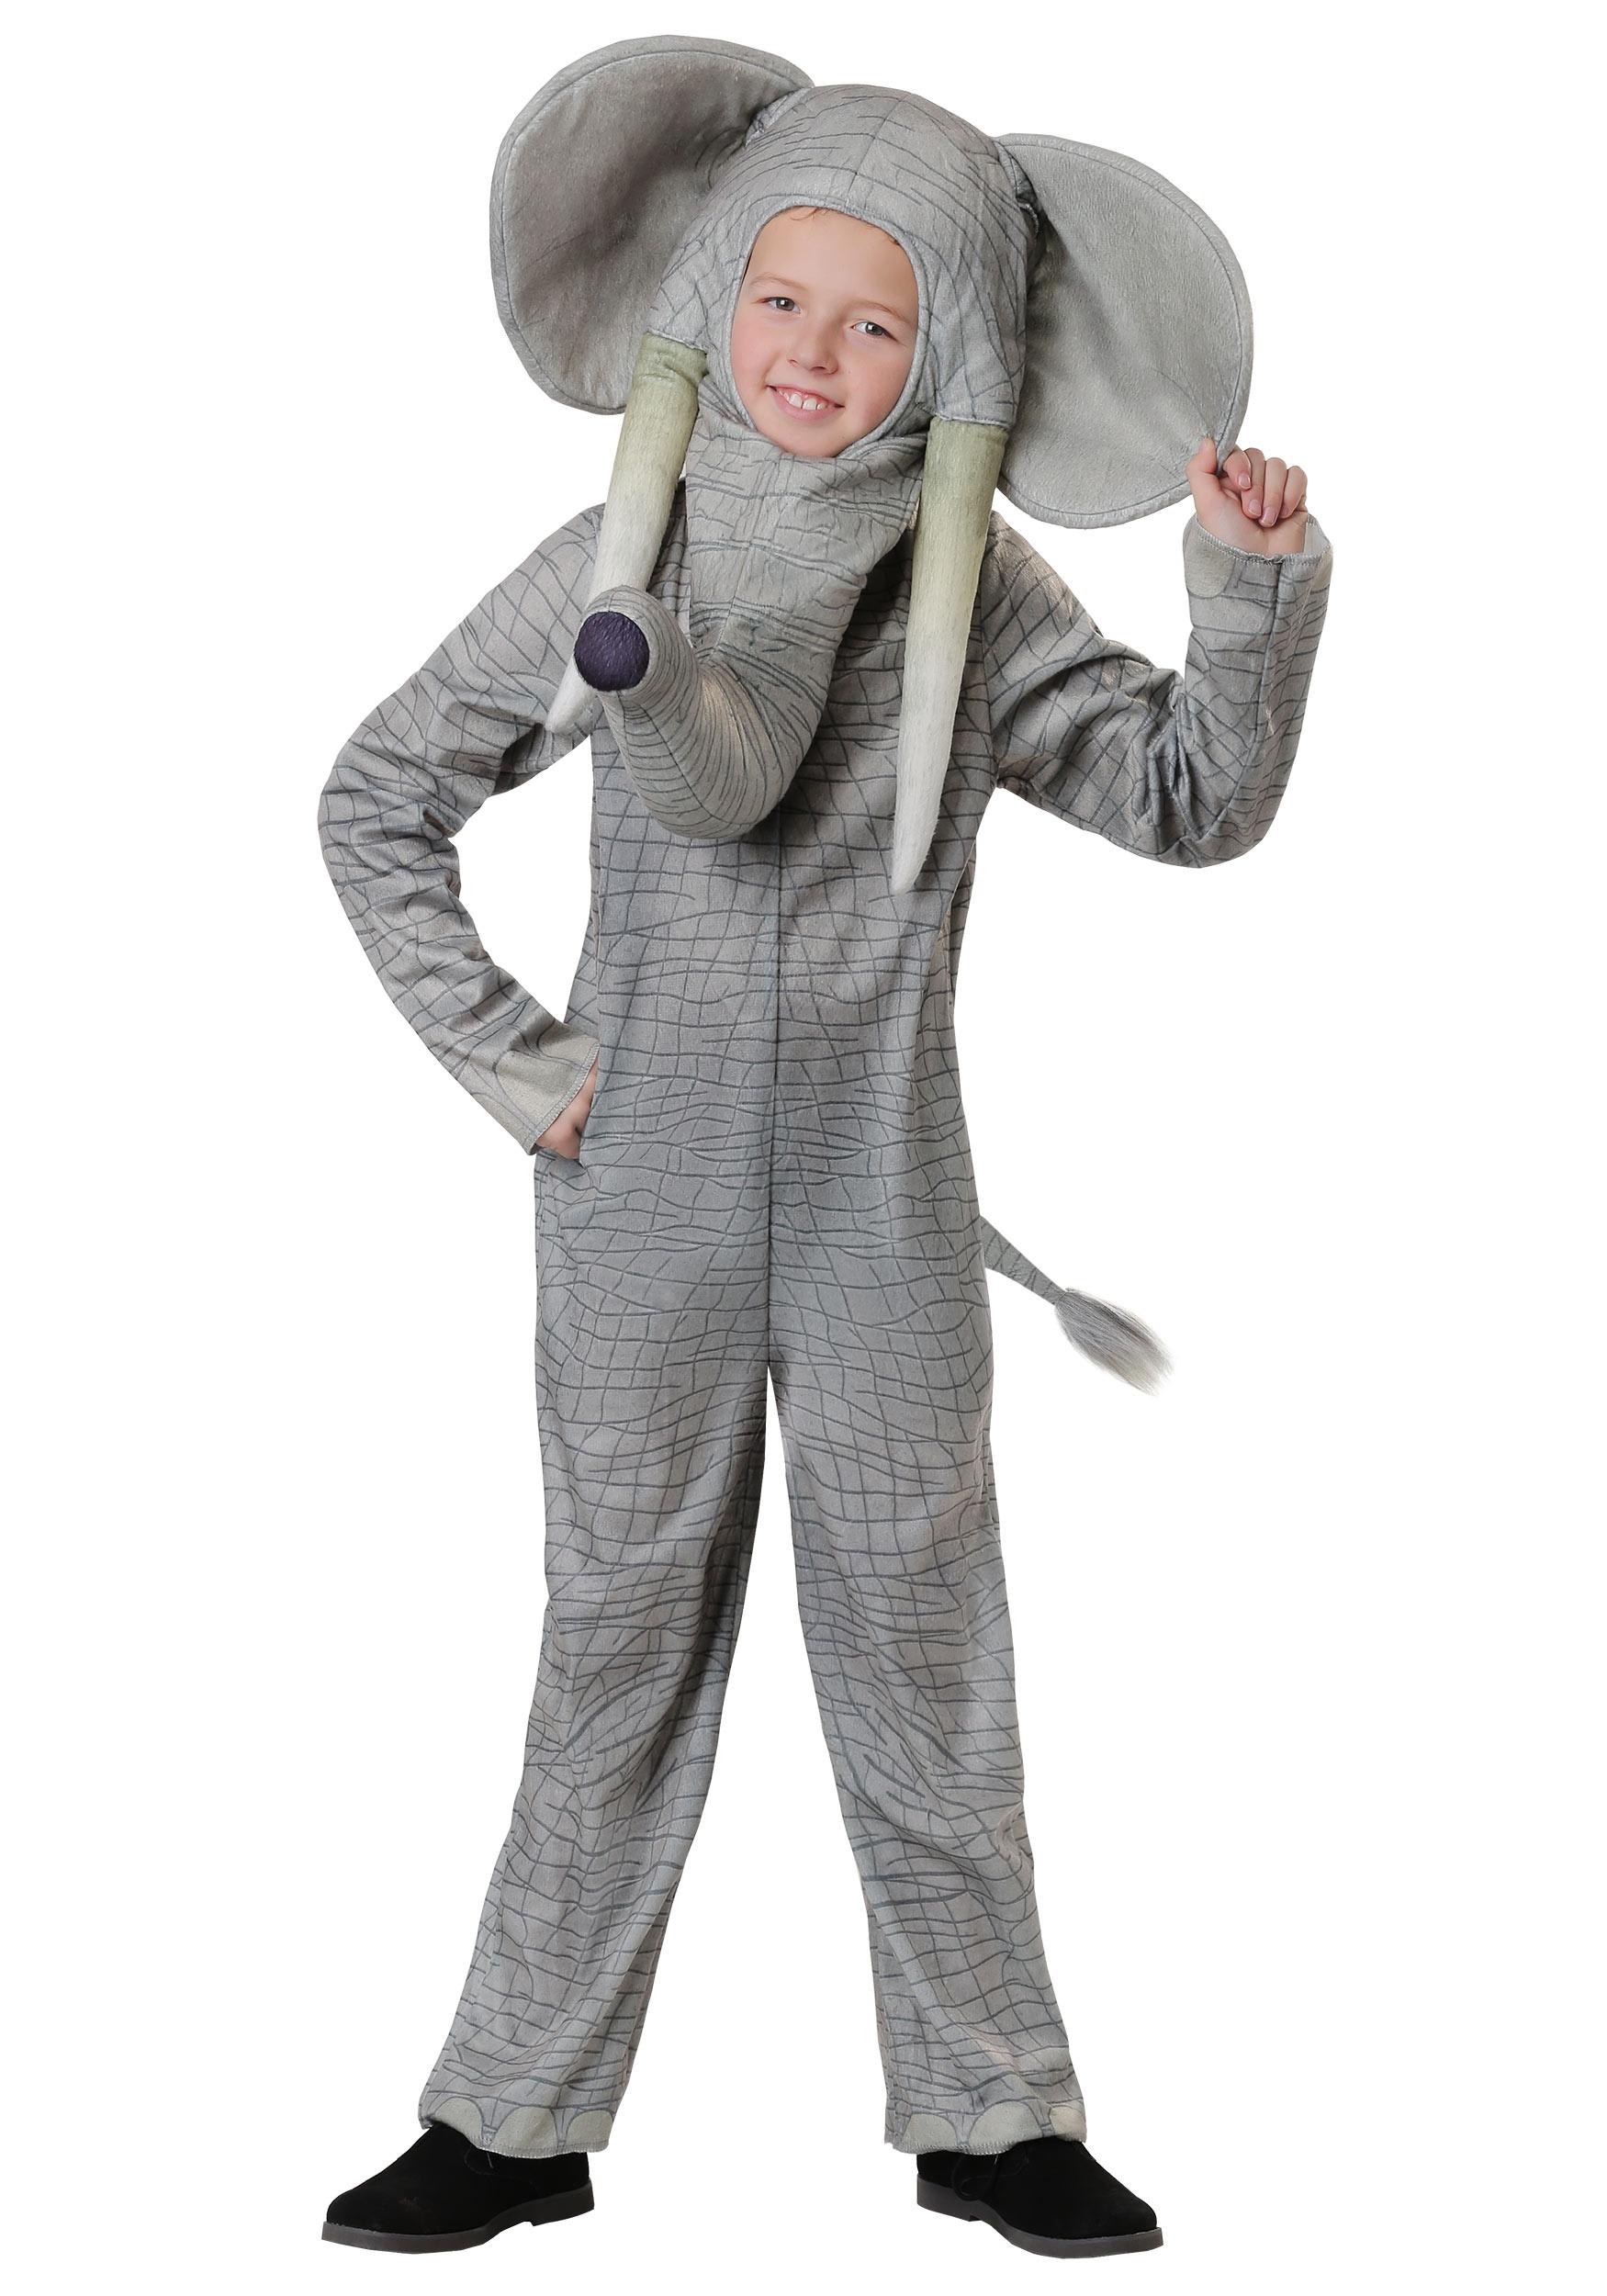 Realistic Elephant Costume for Kids